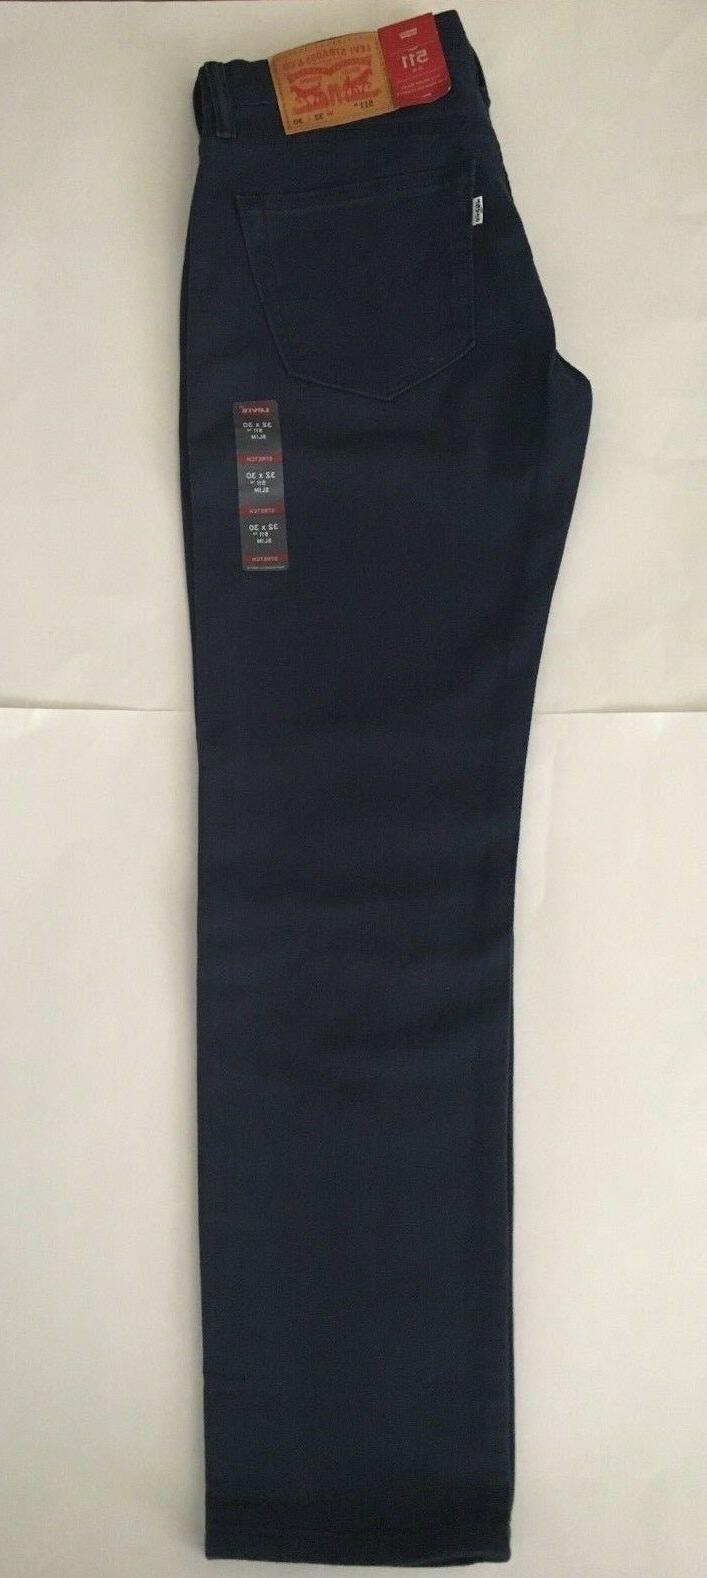 NEW Men's Levi's Slim Fit Dress Blues $69